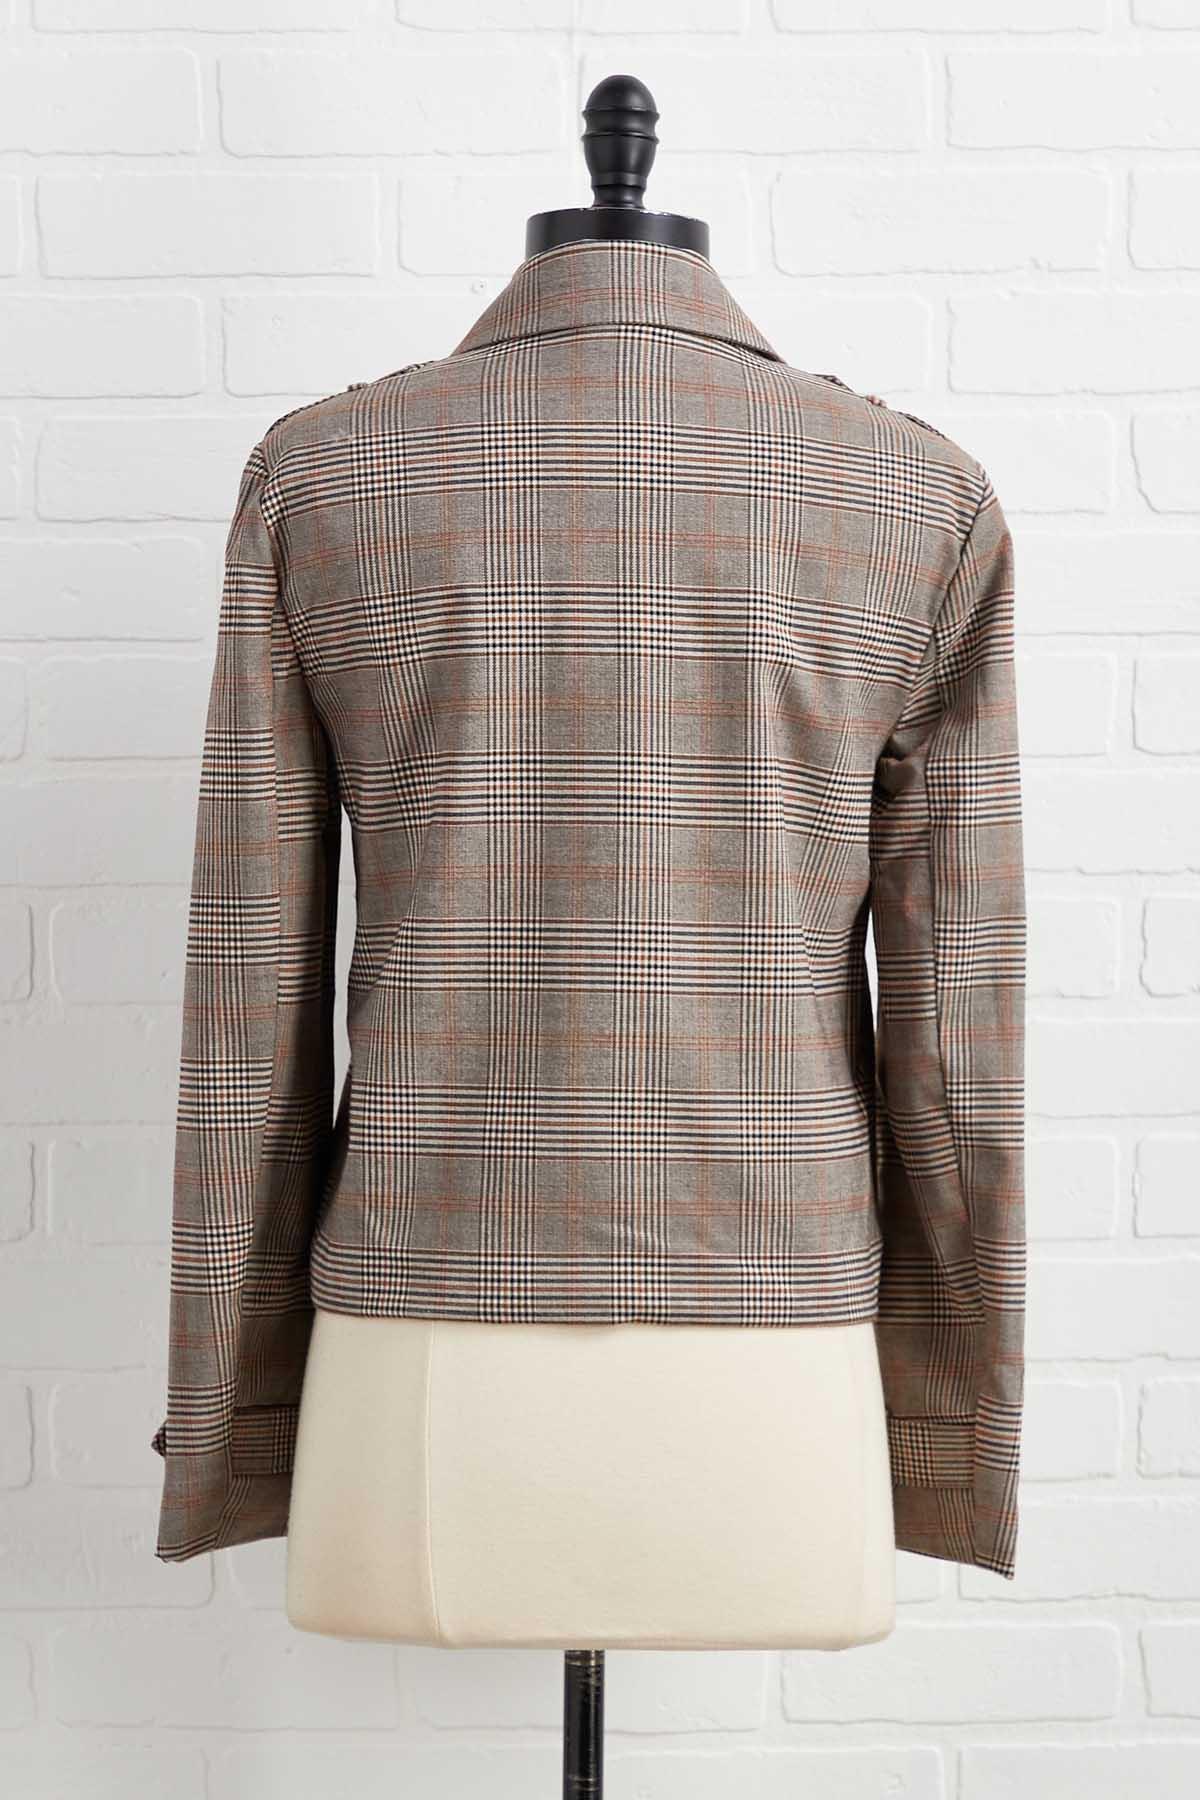 Our Favorite Checks Mix Jacket